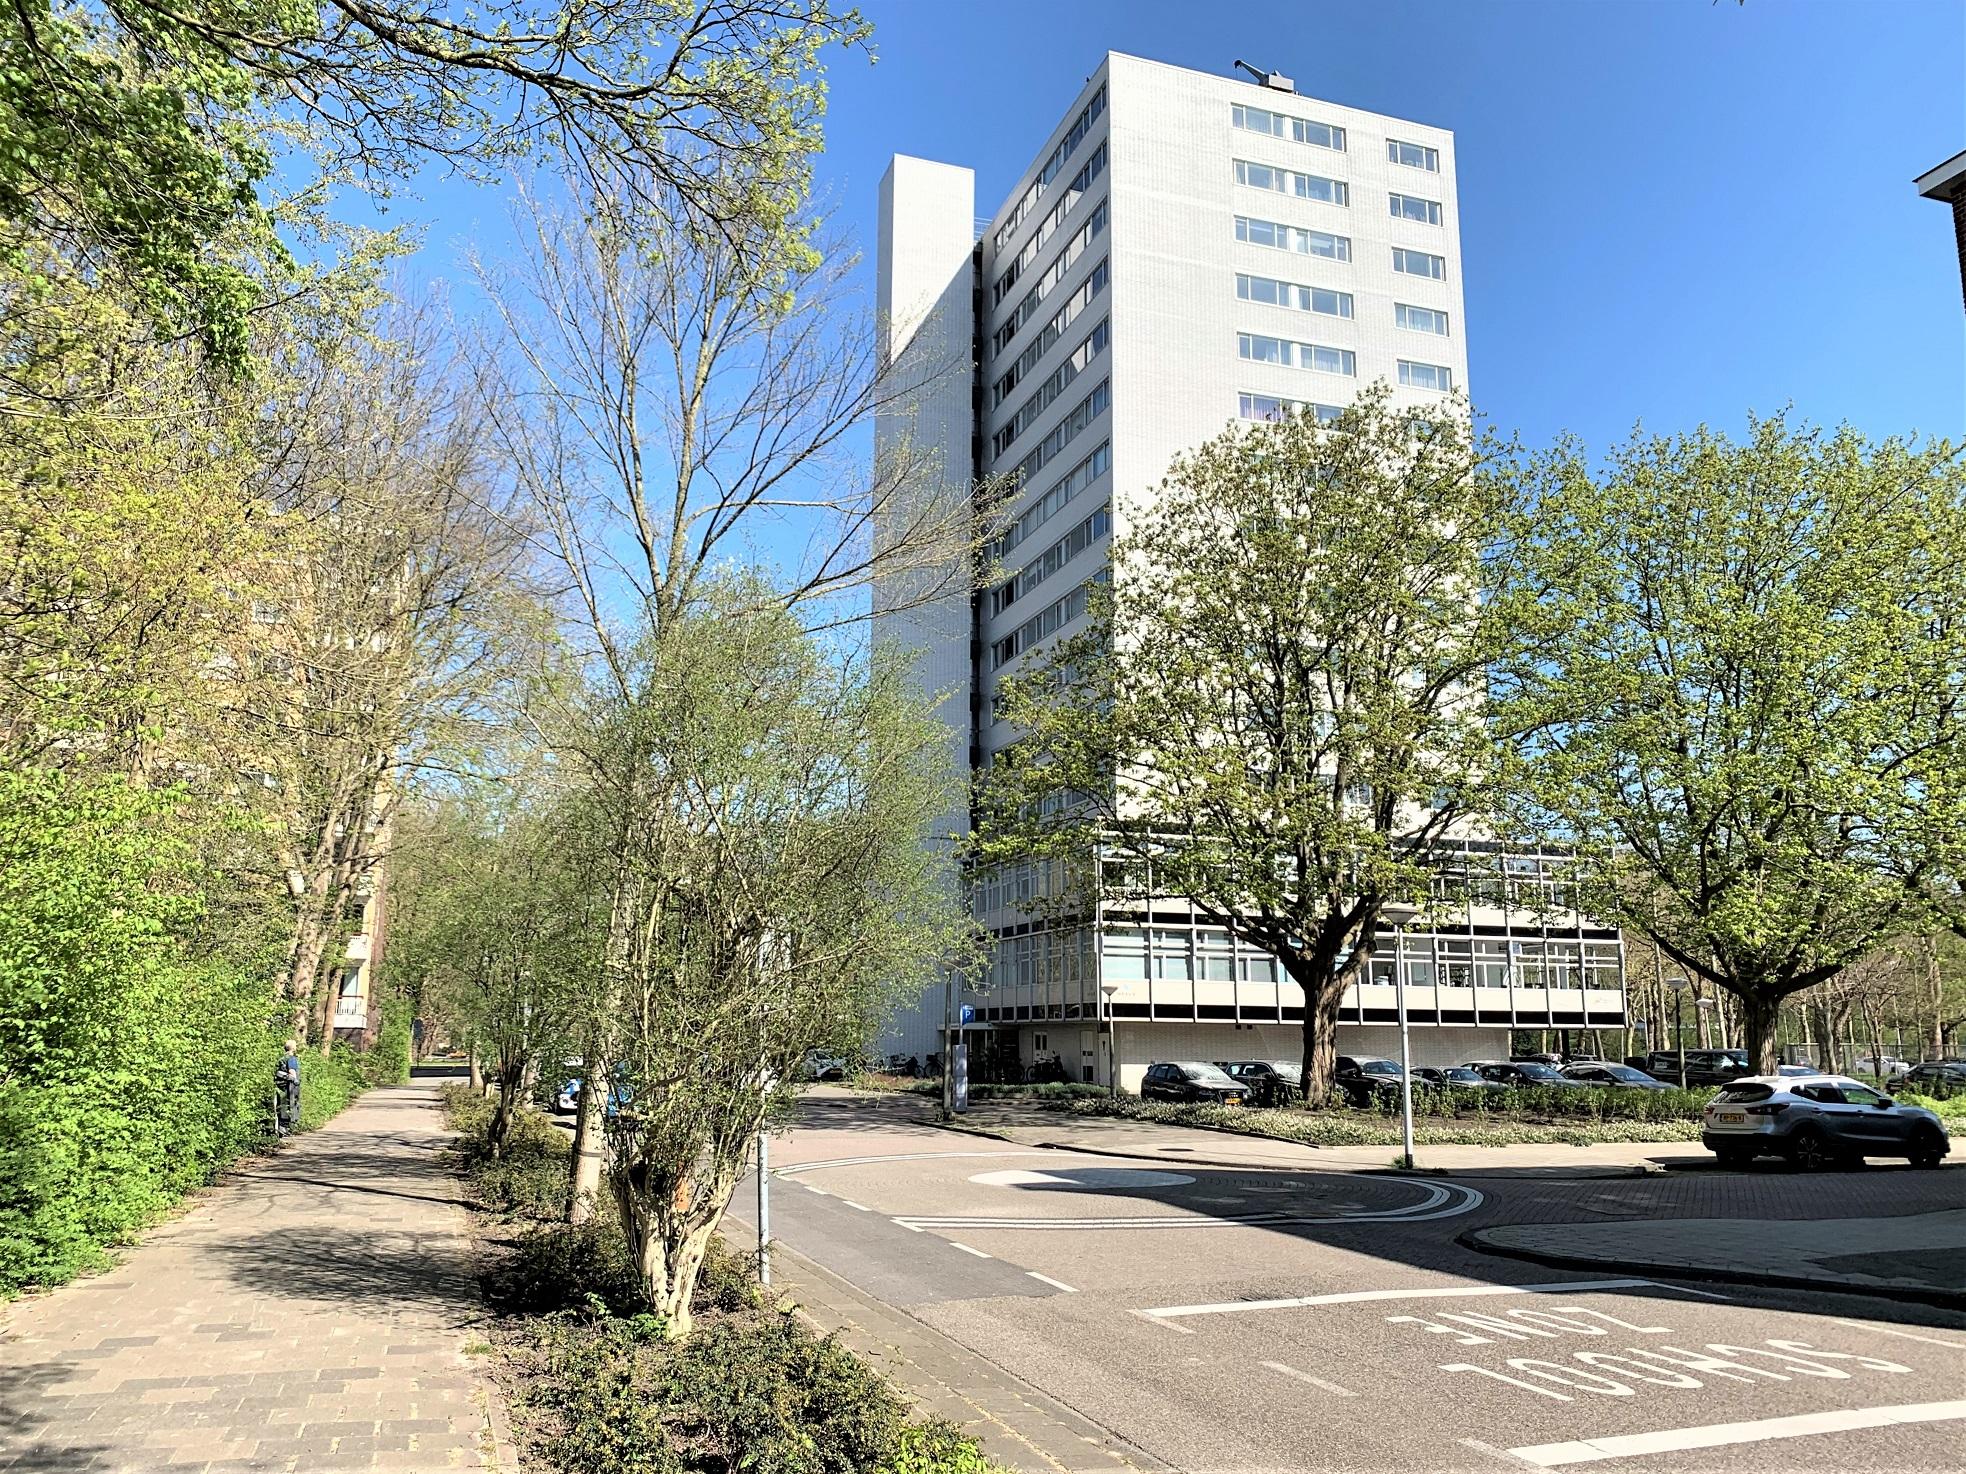 Backershagen 37, Amsterdam